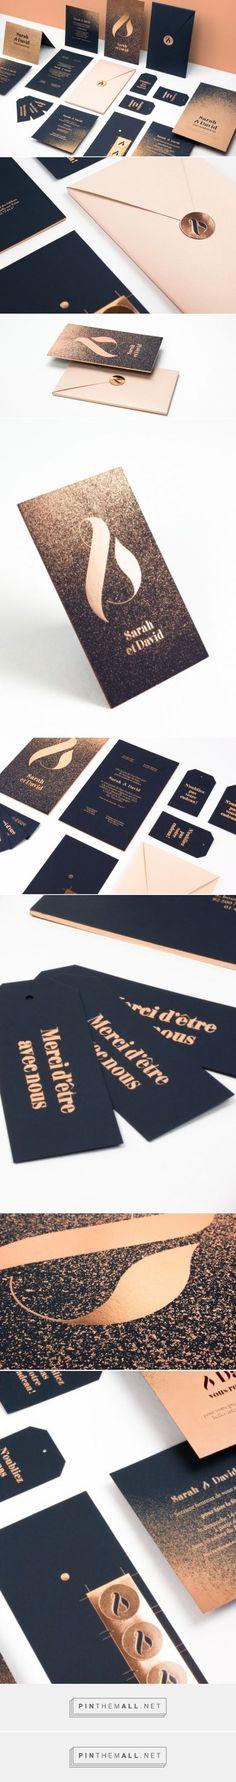 Black and Gold Wedding Invitation Set by Folsom Studio | Fivestar Branding – Design and Branding Agency & Inspiration Gallery